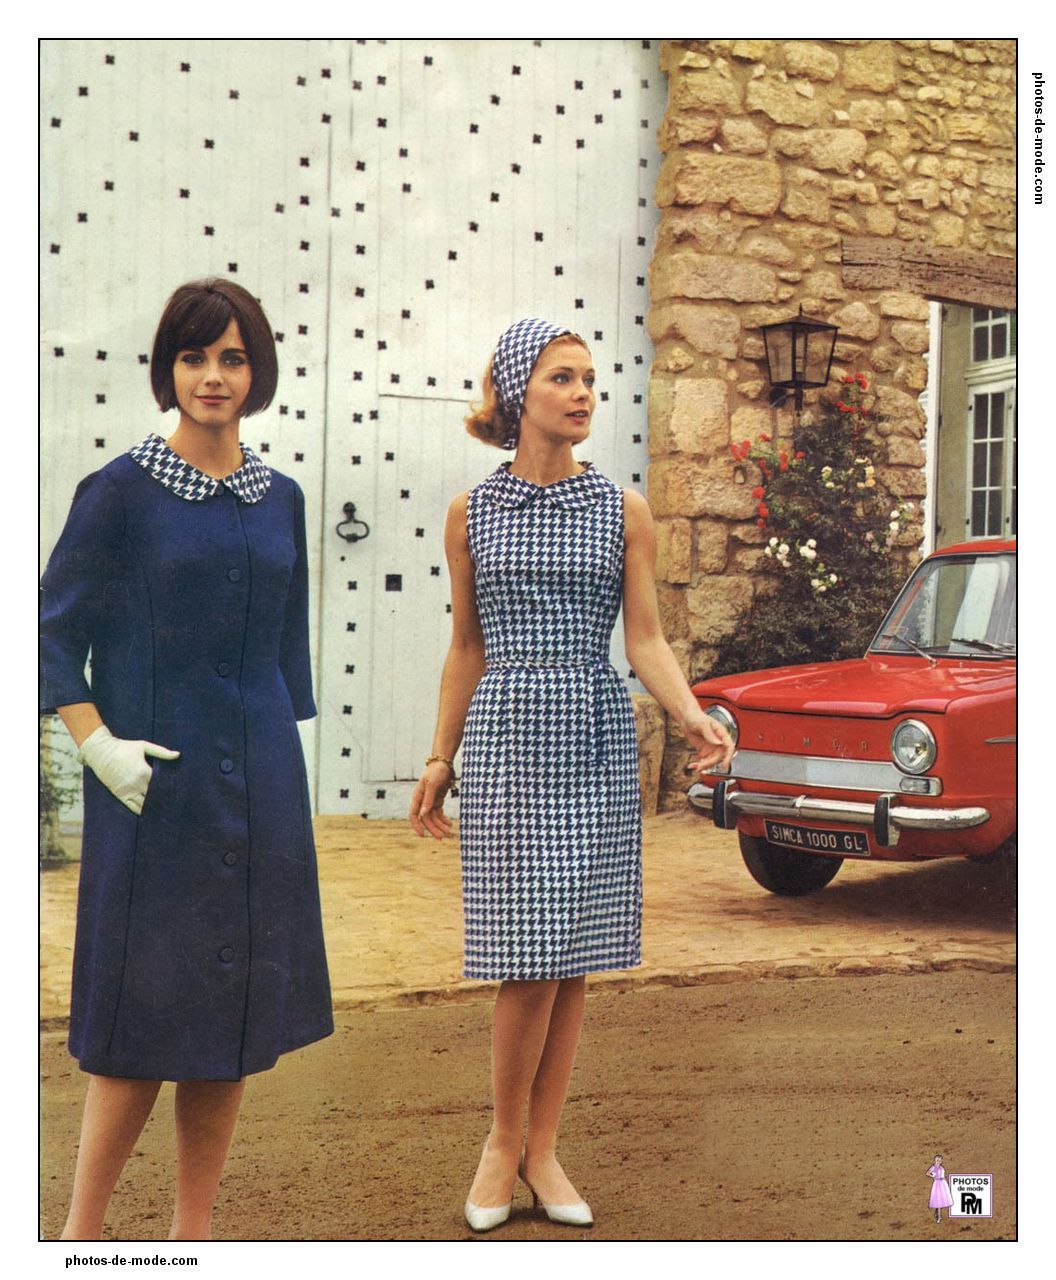 mode ann es 60 1964 vintage dress 60 39 s en 2019 retro mode mode ann e 60 et mode. Black Bedroom Furniture Sets. Home Design Ideas